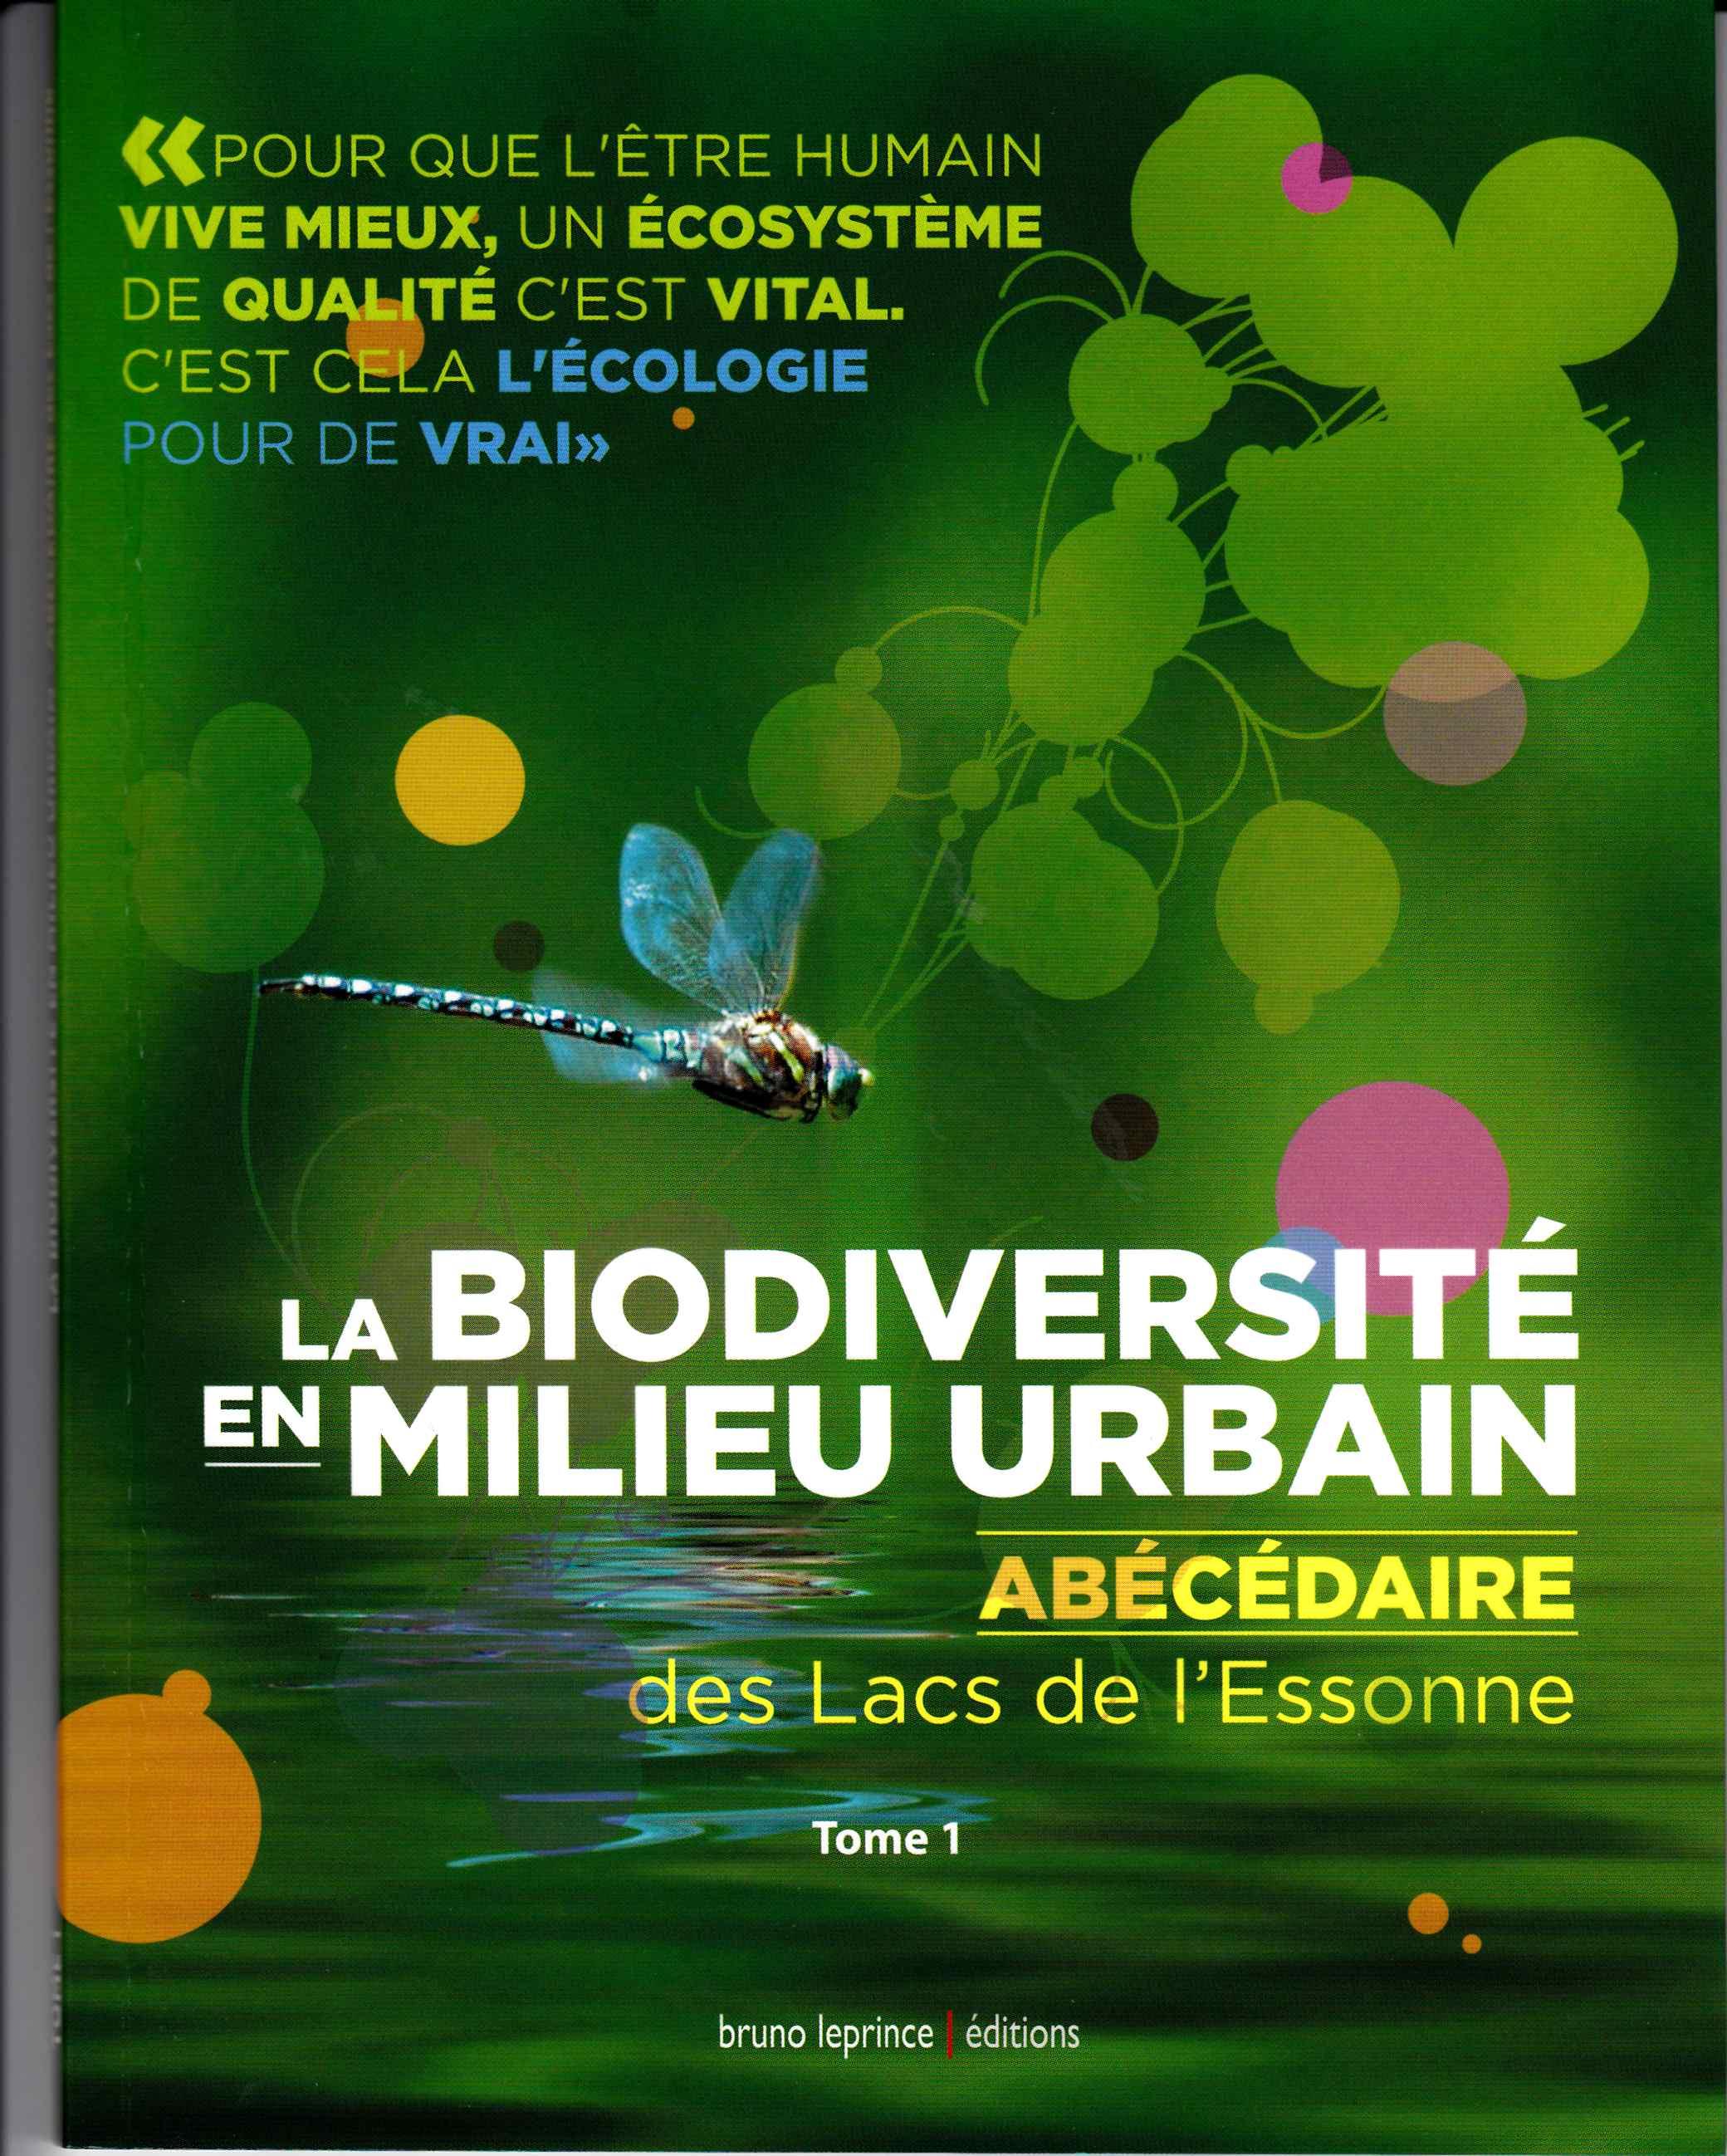 http://www.savigny-avenir.fr/wp-content/uploads/2013/01/IMG2.jpg